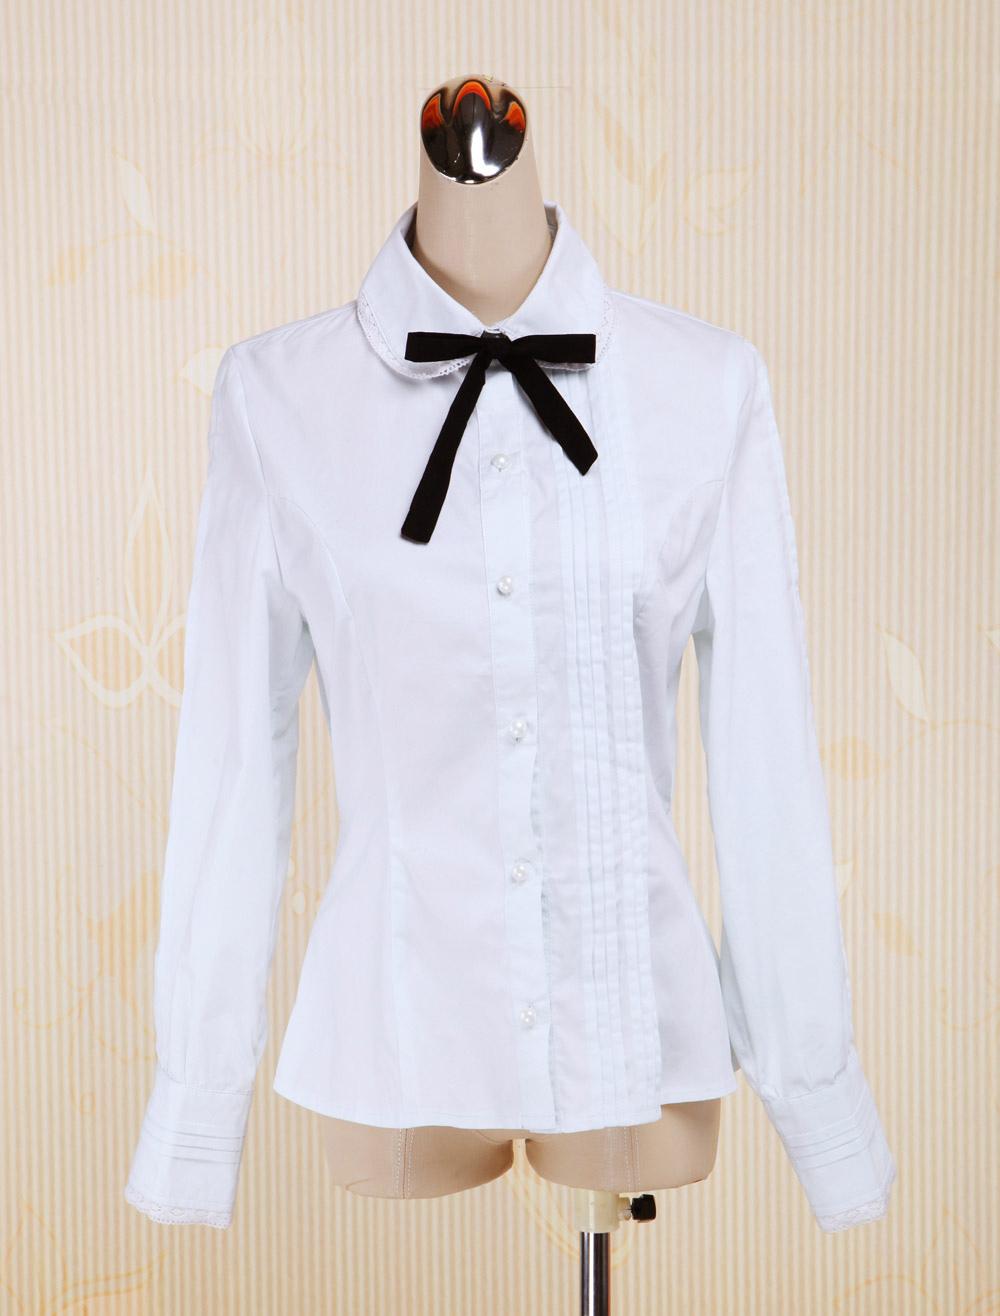 White Cotton Lolita Blouse Long Sleeves Turn-down Collar Bow